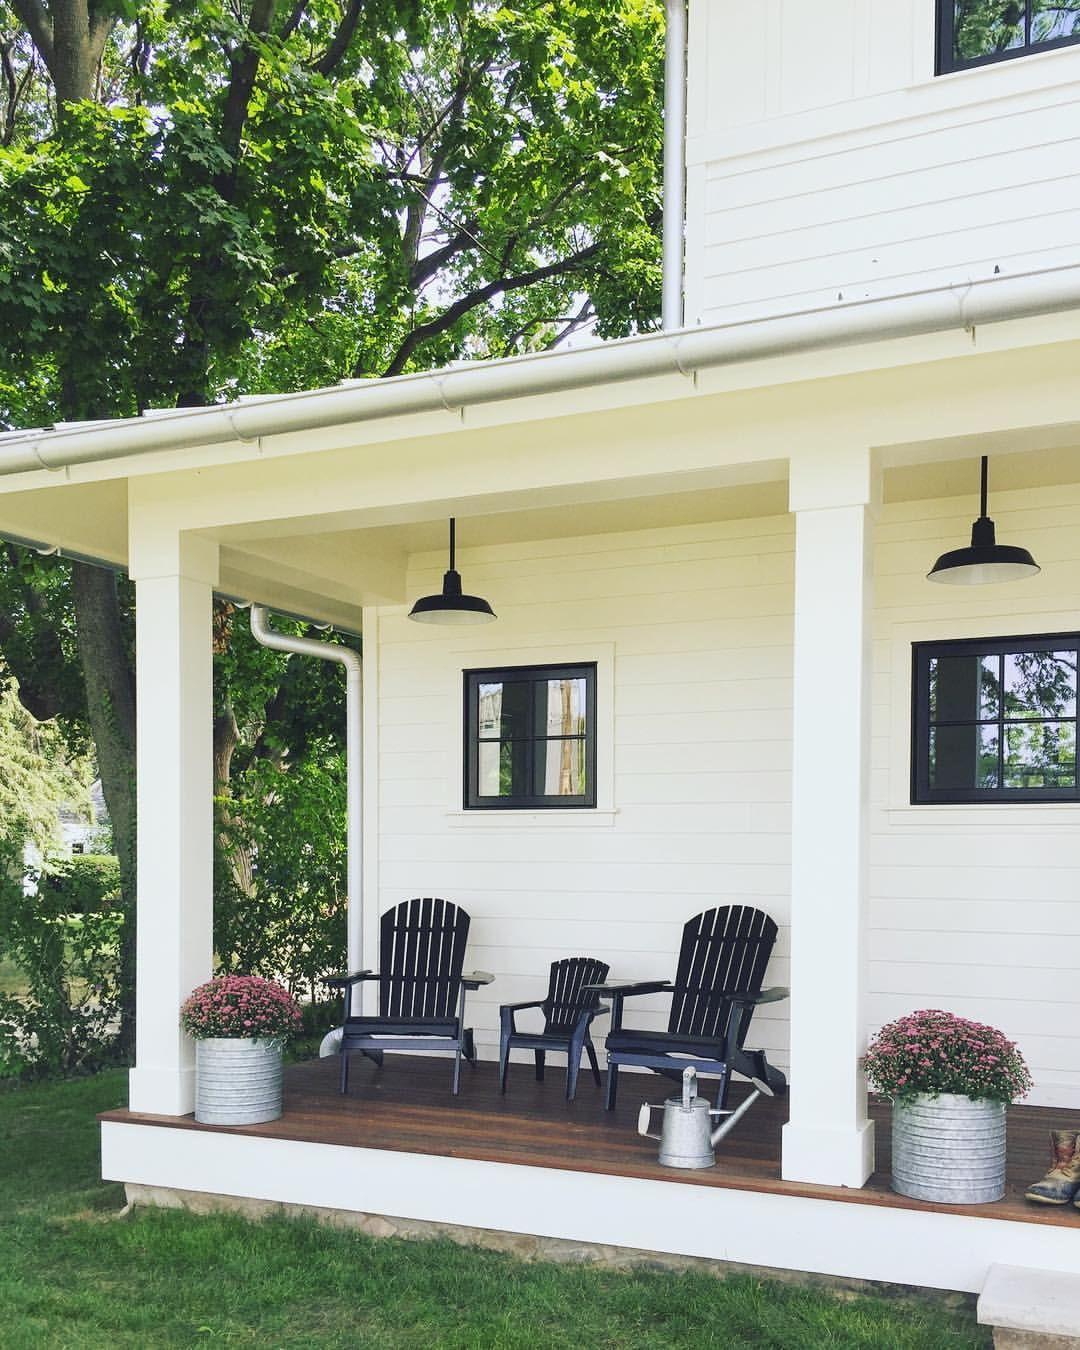 Farmhouse Is My Style On Instagram Cute Modern Farmhouse Porch